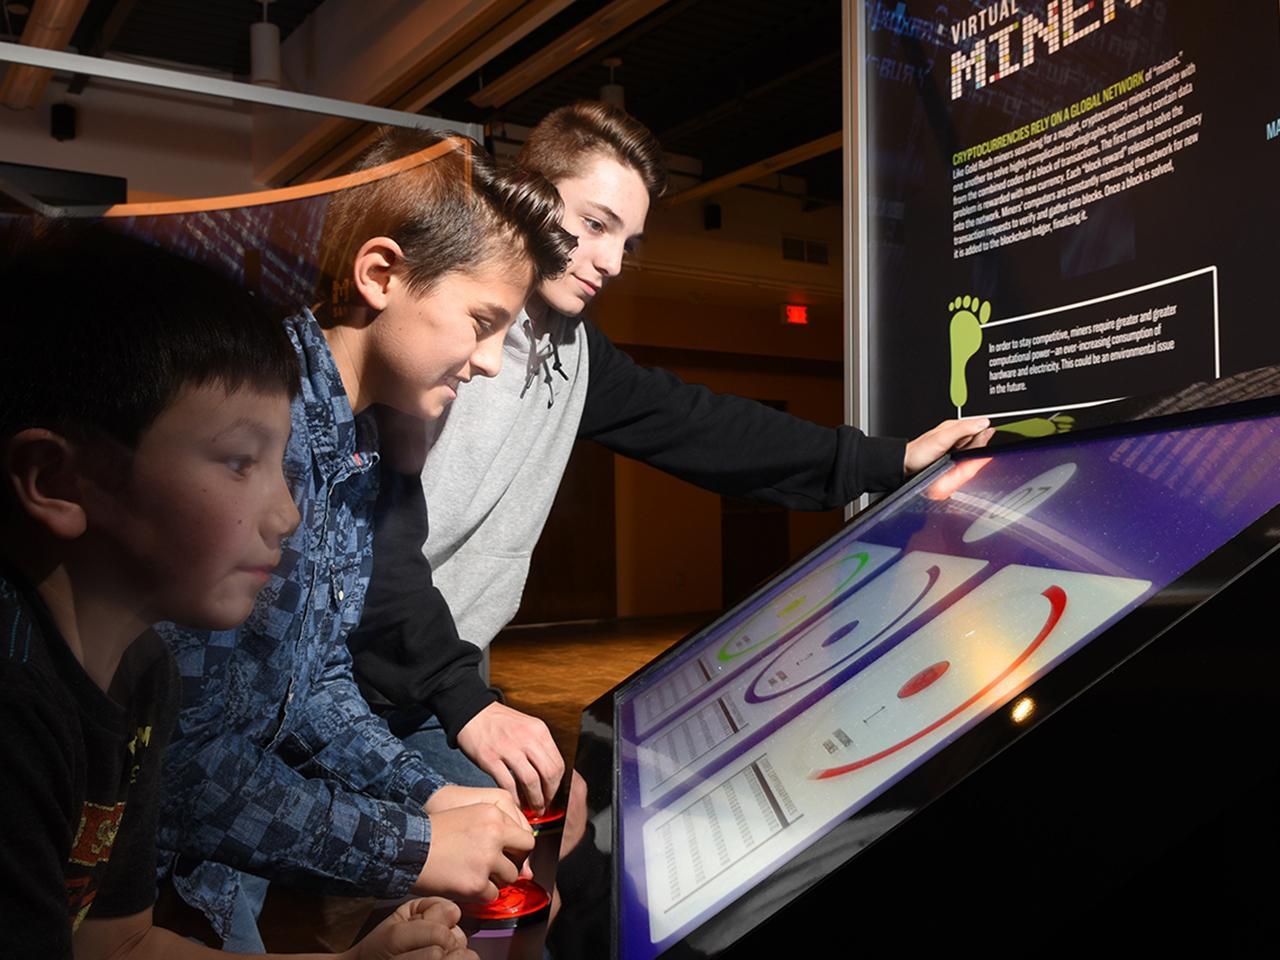 three boys at a video game terminal